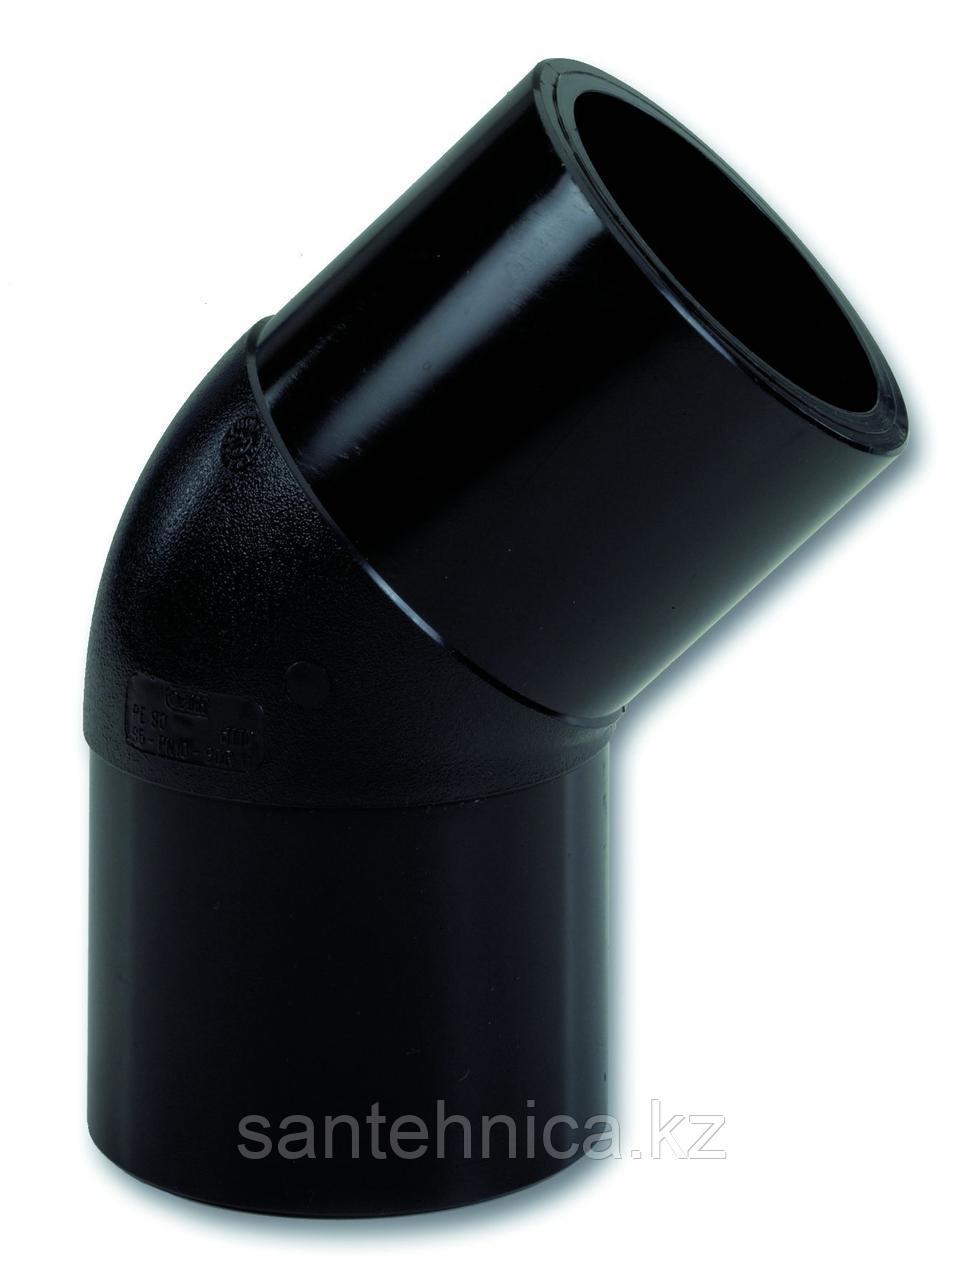 Отвод ПЭ100 спигот Дн 110*45гр SDR 17 Ру10 напорный